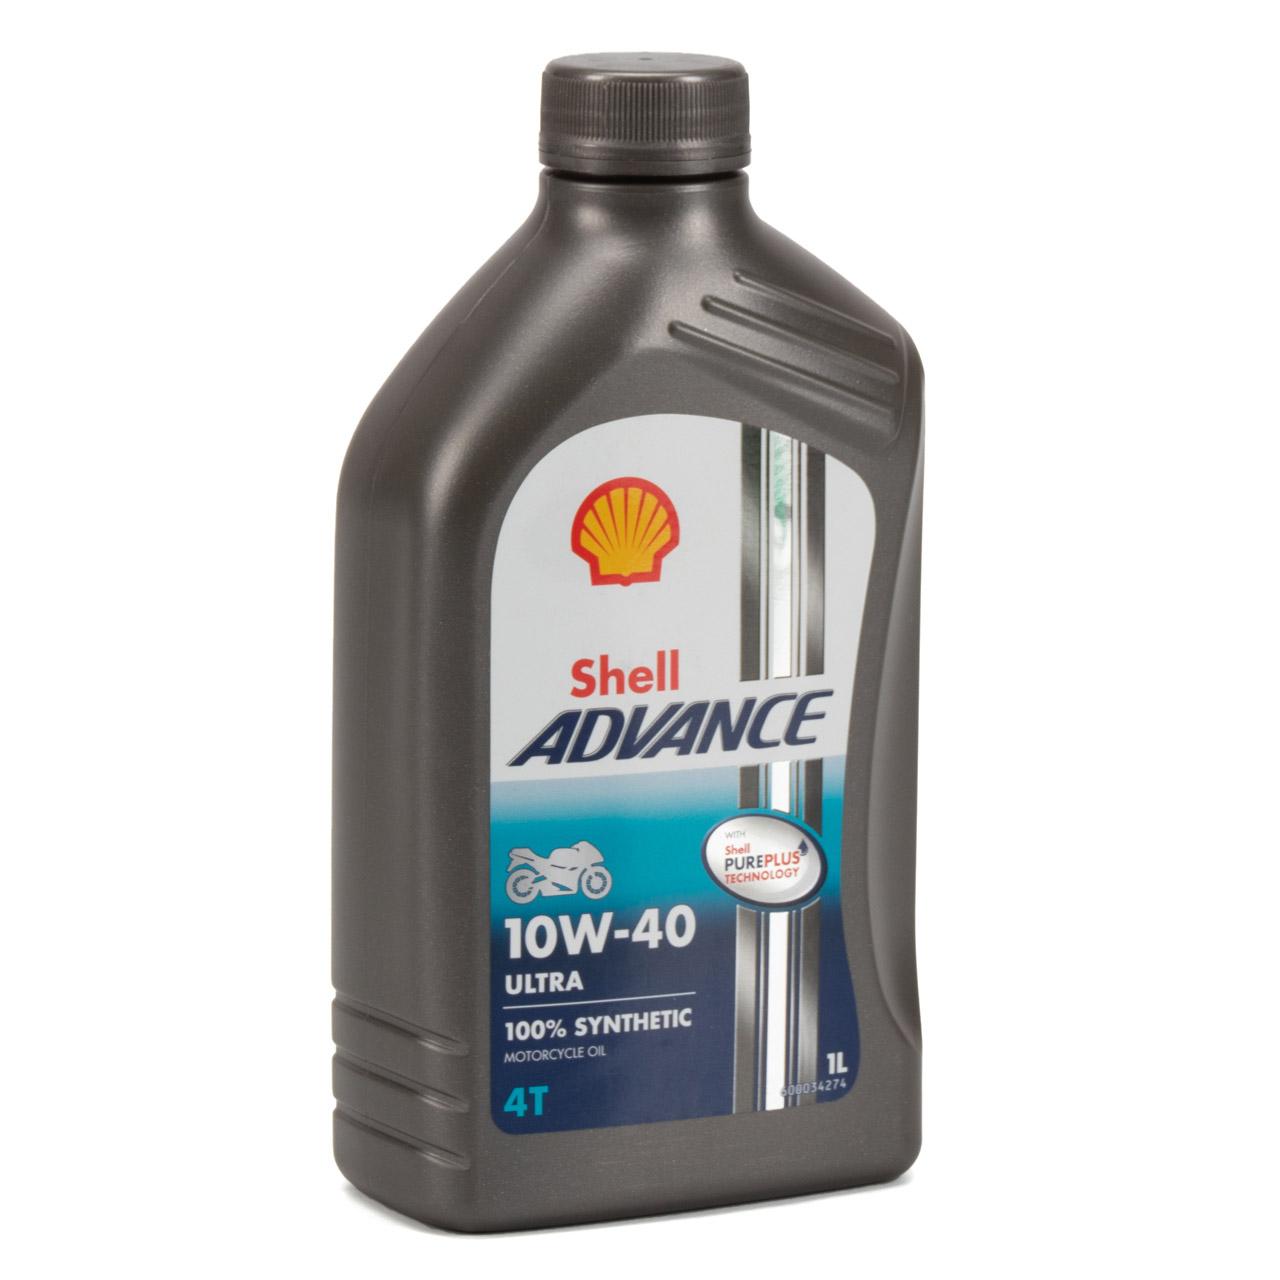 SHELL Motoröl Öl ADVANCE ULTRA 4T 4-TAKT 10W-40 API SN JASO MA-2 - 5L 5 Liter